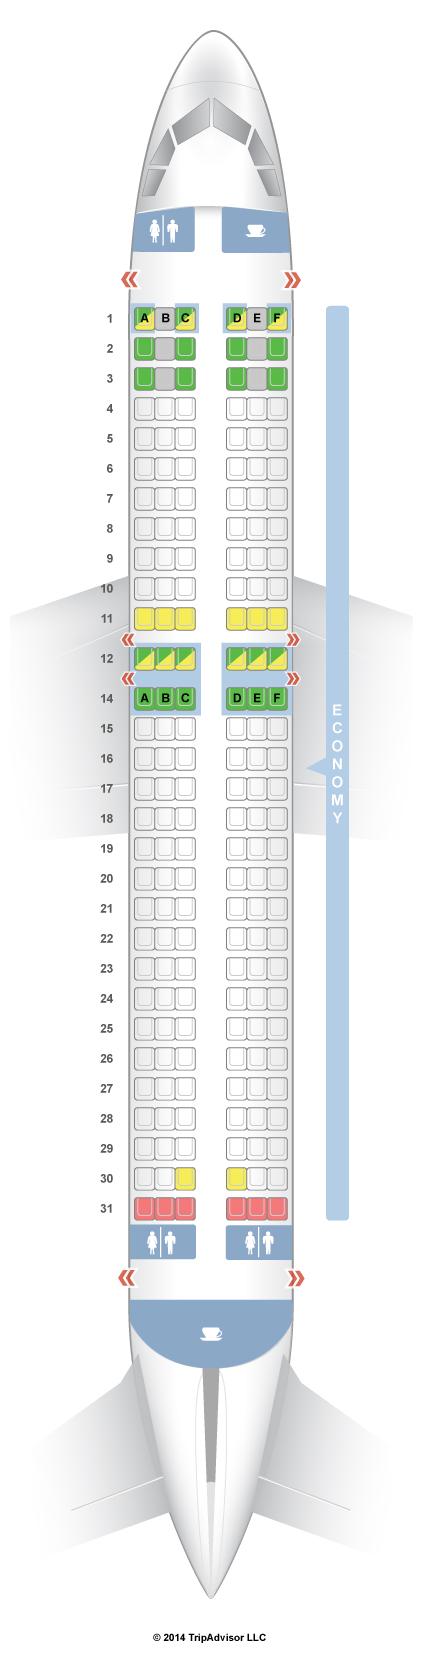 SeatGuru Seat Map Vueling Airlines - SeatGuru on airbus a320 100 200 seat map, jetblue airbus a320 seat map, delta 76w business class seats, delta airbus a332 seating-chart, frontier airbus a320 seat map, airbus industrie a320 seat map, delta airbus a330-300 333 seating-chart, a 320 seat map, boeing 757-200 seat map, aer lingus airbus a330-200 seat map, avianca airbus a320 seat map, delta airbus a340-600 seat map, delta airline seating arrangement, hawaiian air airbus a330 jet seat map, airbus 320 seat map, delta airbus a333 seat map, delta boeing 757 passenger seats, air canada airbus a320 seat map, spirit airlines seating chart seat map,